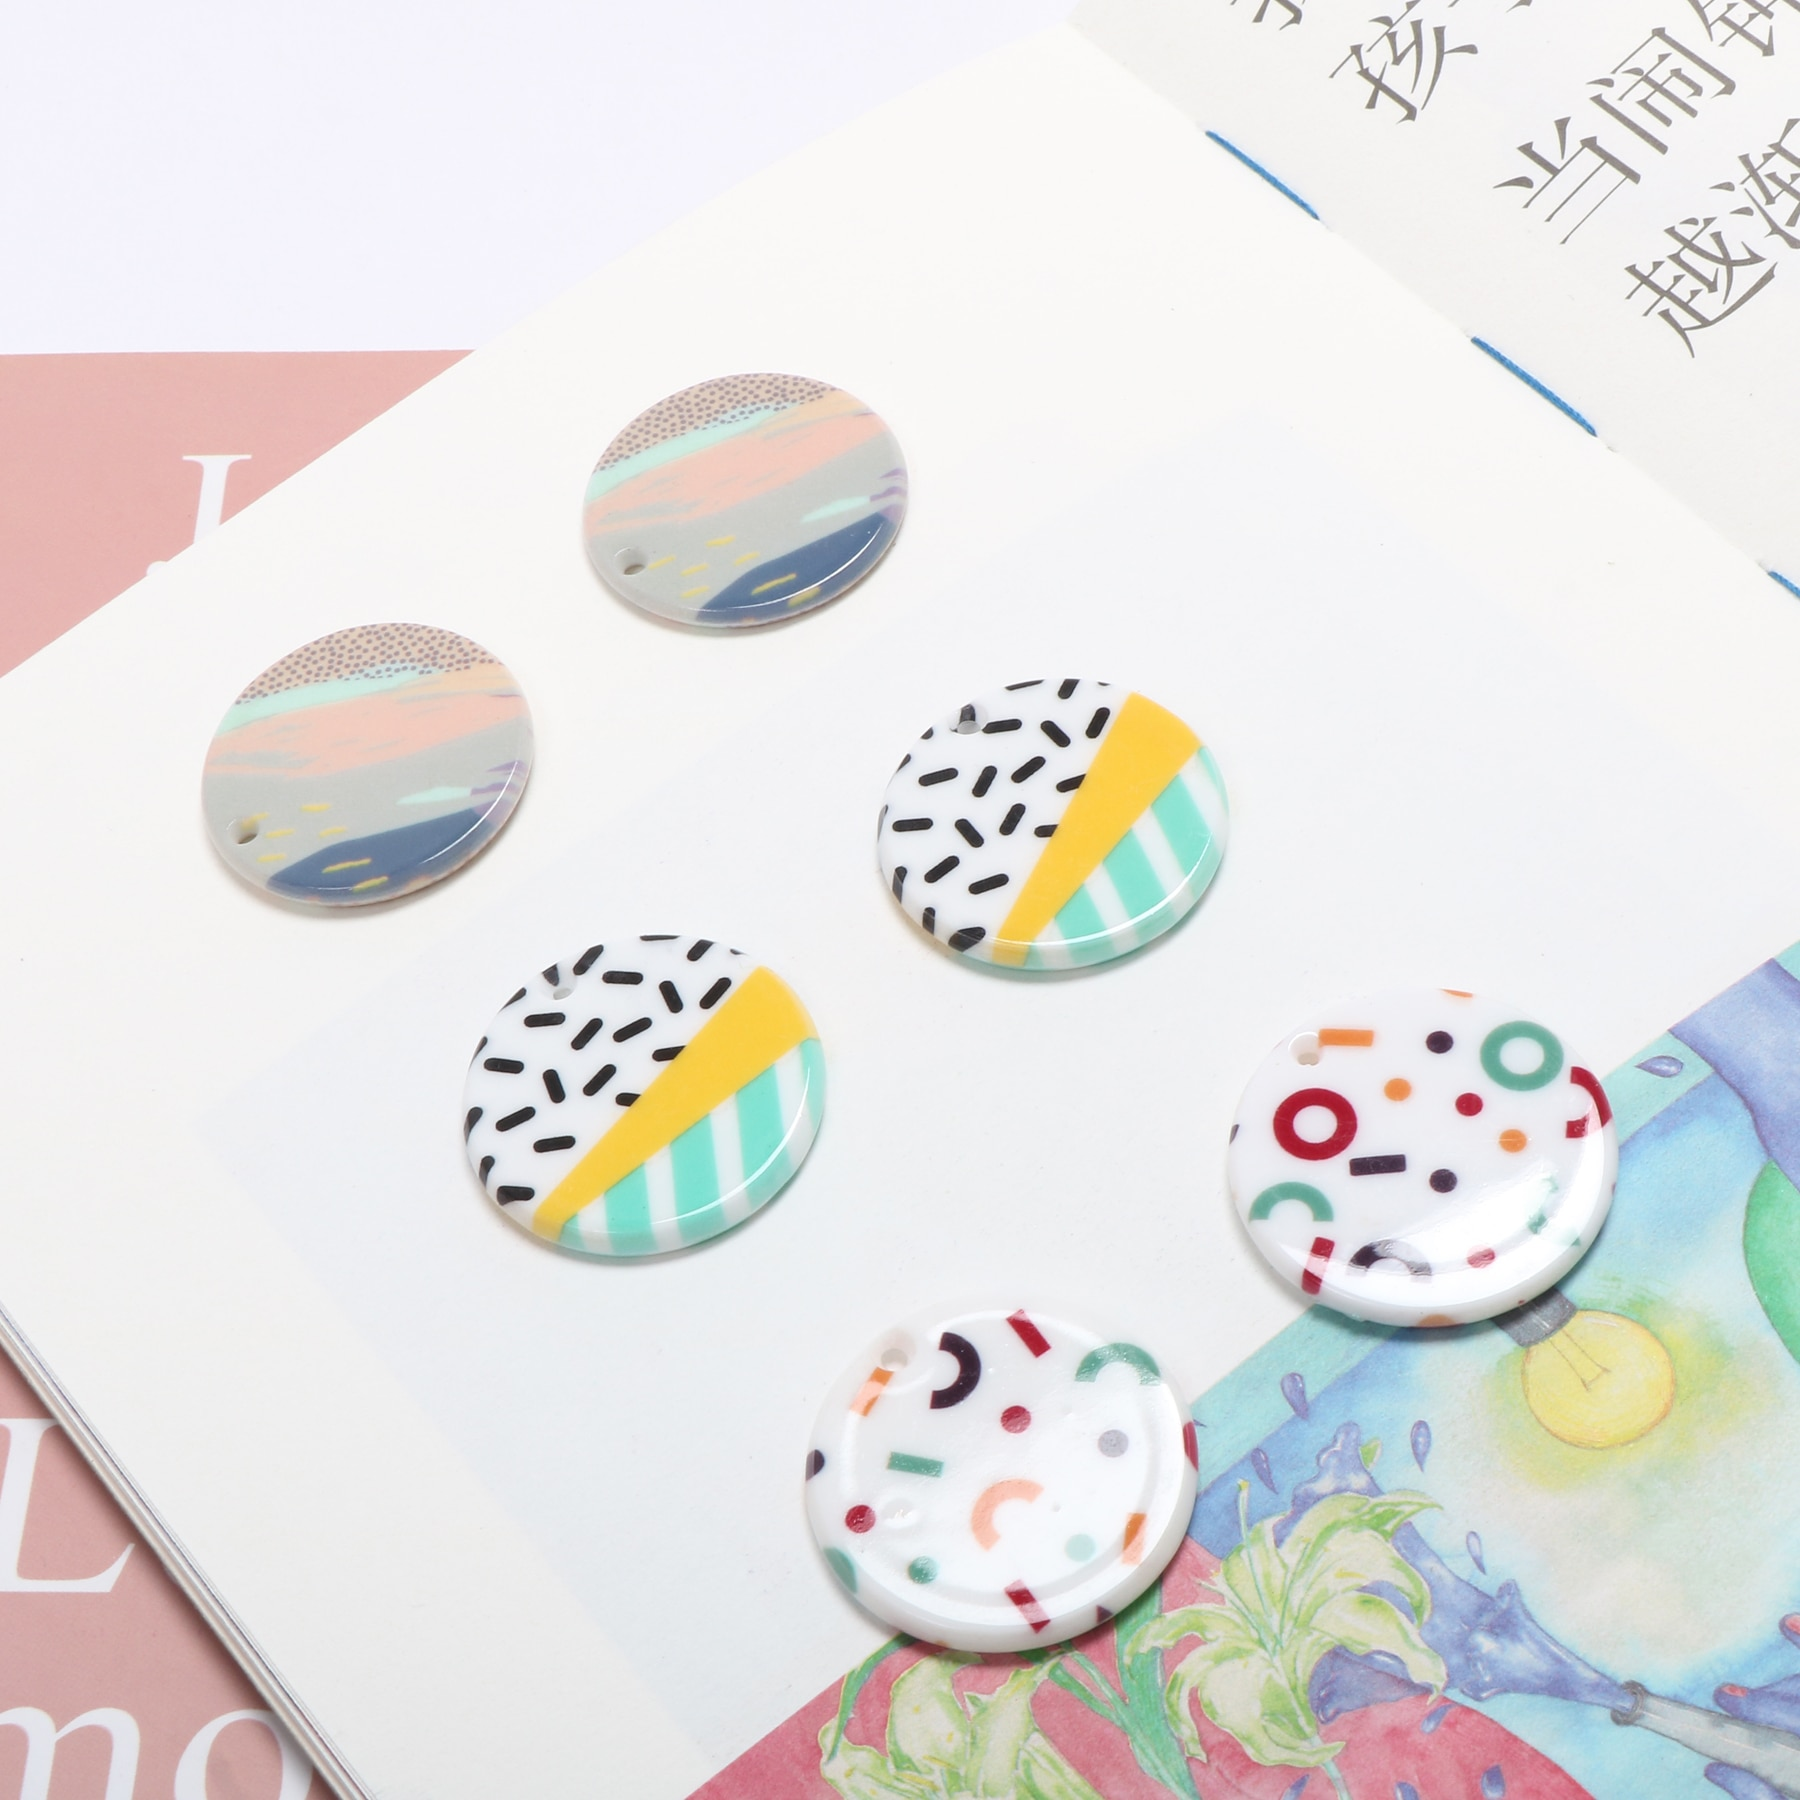 Ins geometric print hit yin child yakri round pendant earrings diy handmade jewelry accessory material